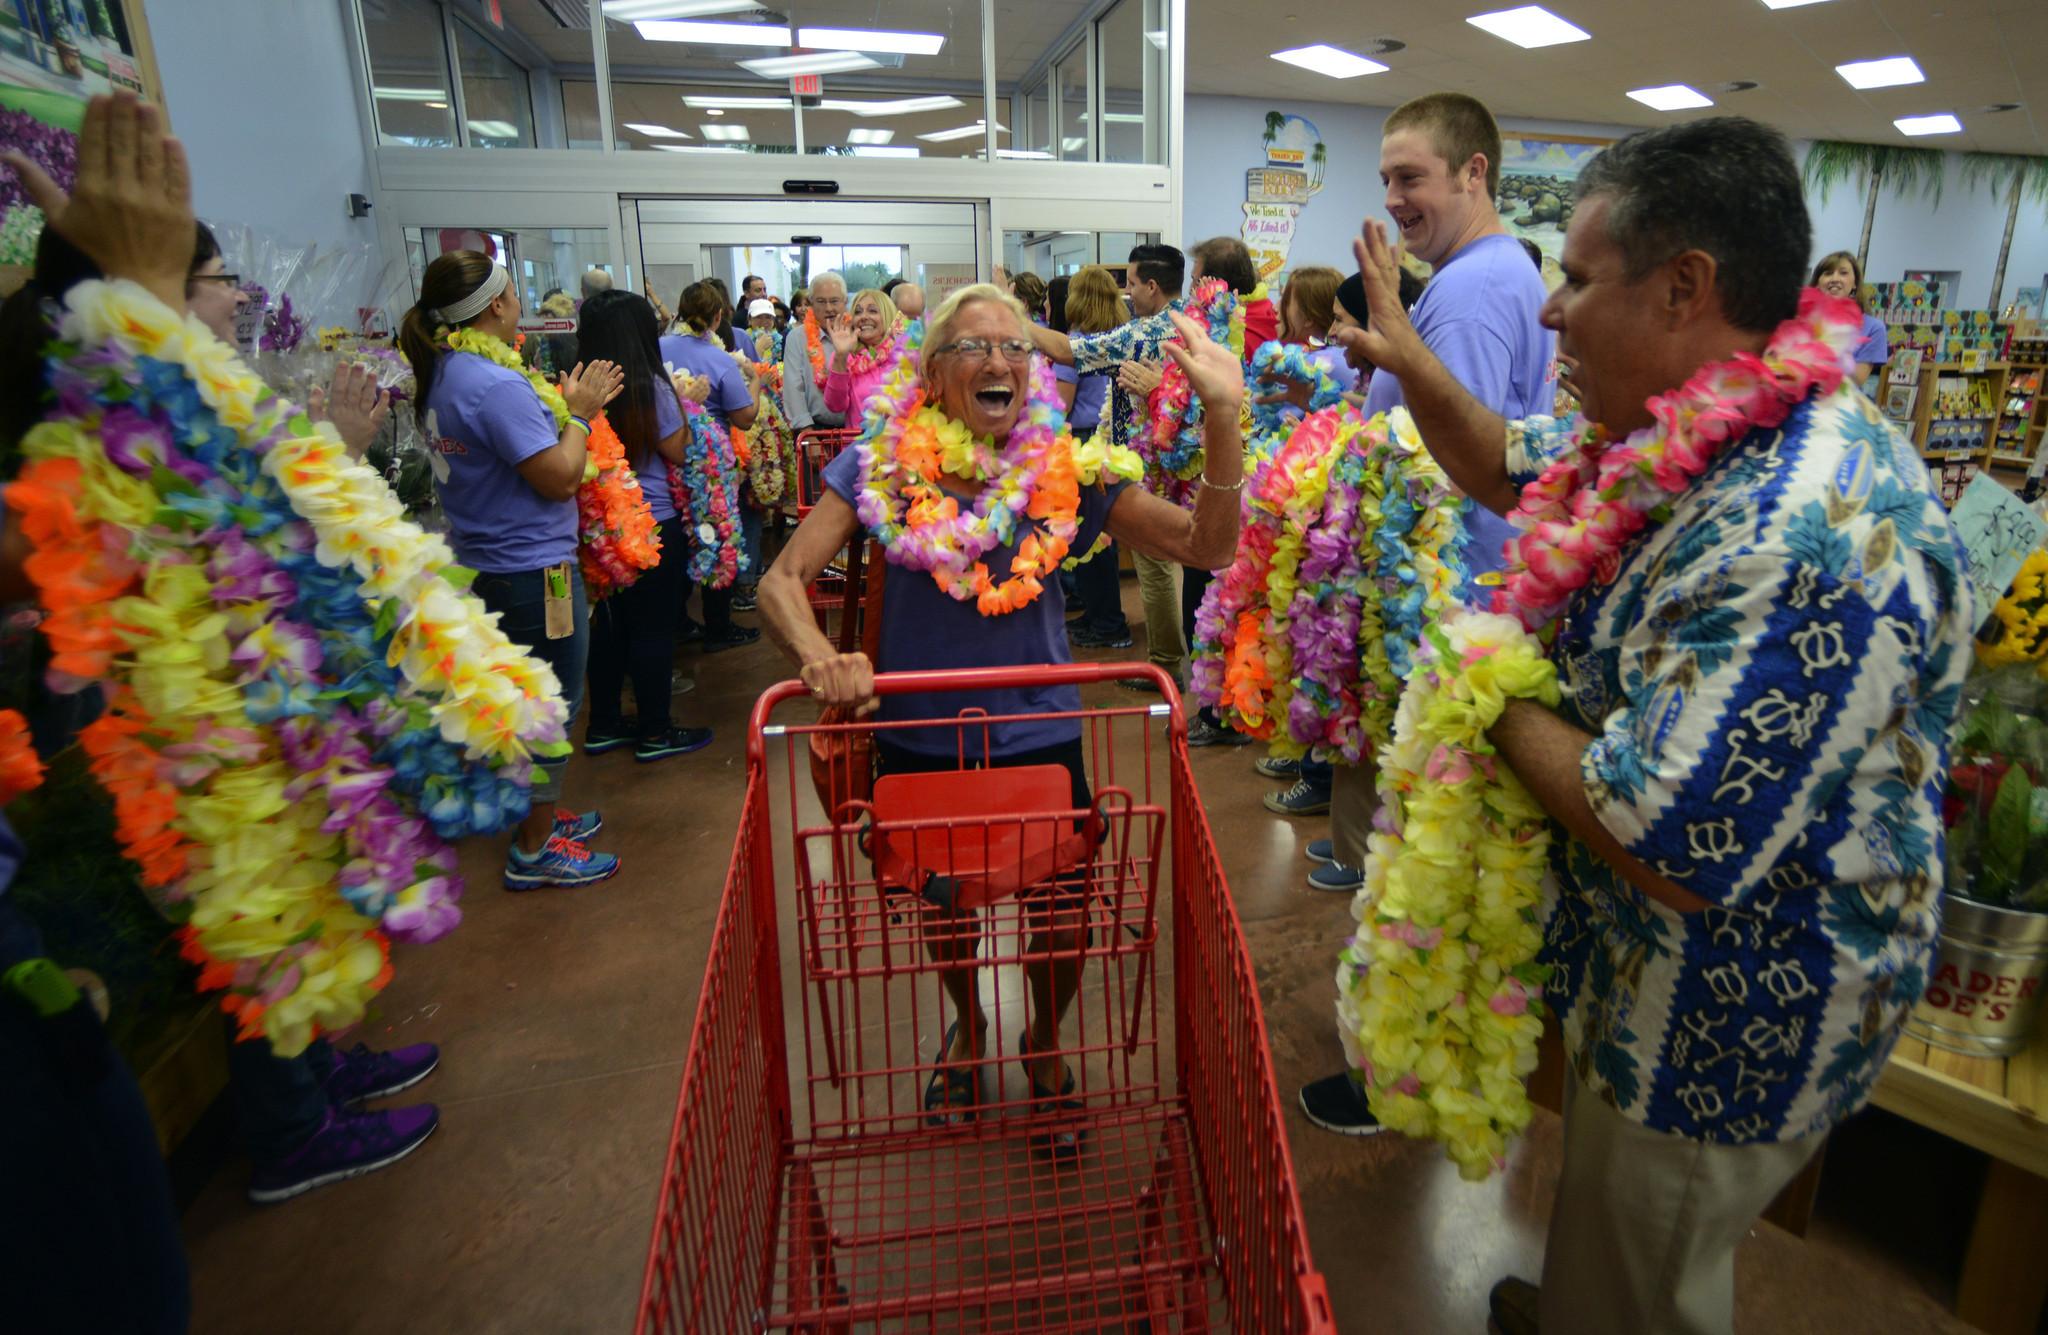 Boca Raton Palm Beach County Opened Its Fourth Trader Joe